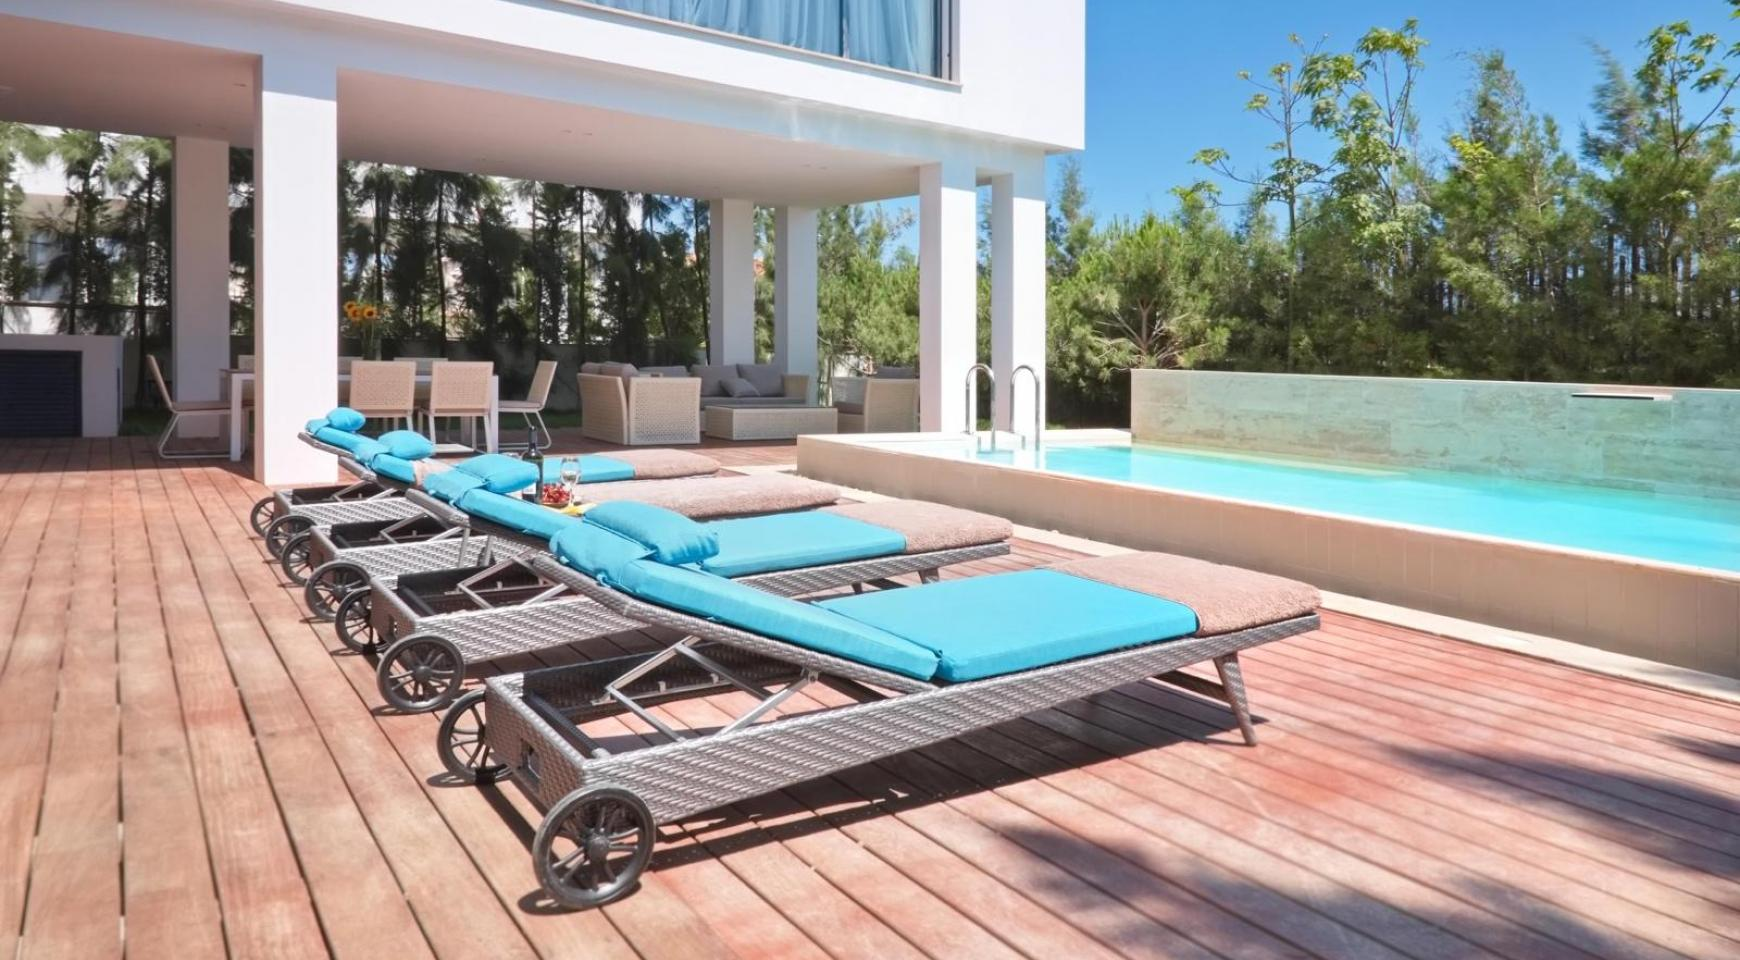 New Luxurious 4 Bedroom Villa in the Tourist Area - 1